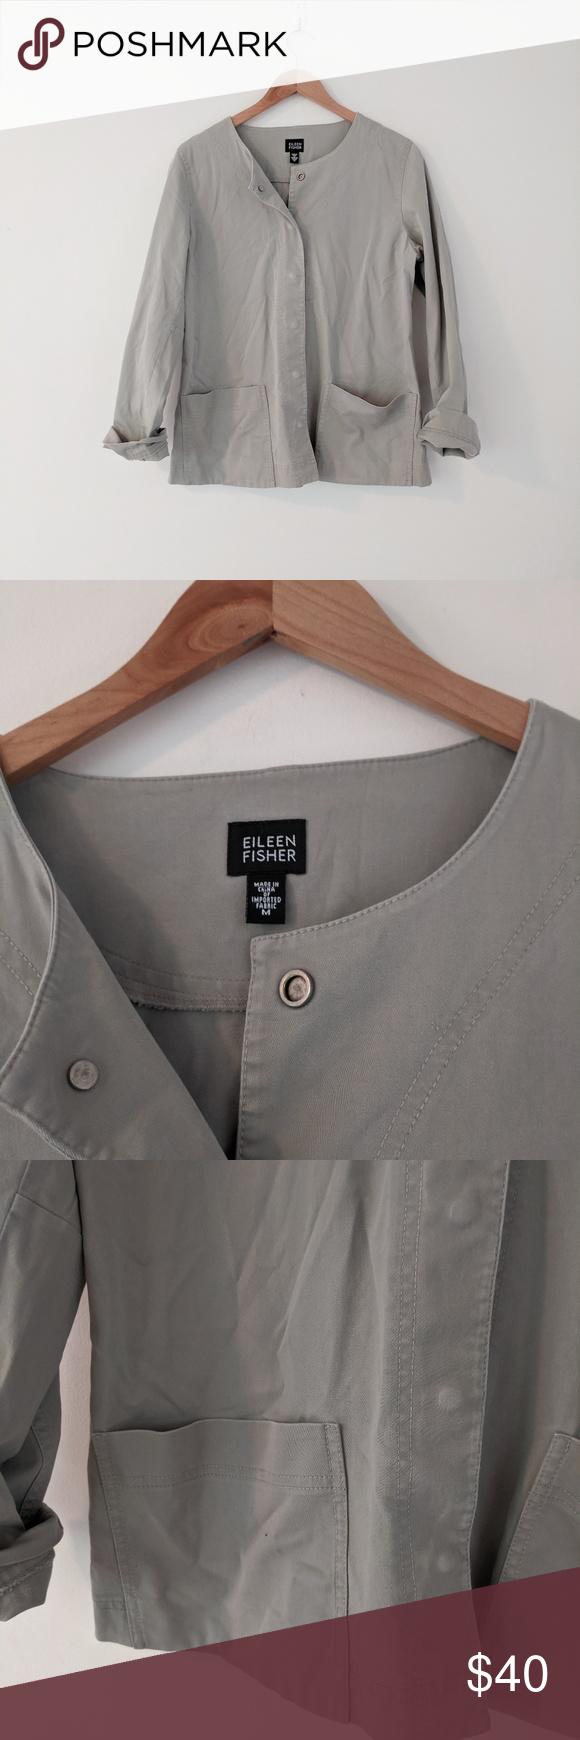 Eileen Fisher Grey Snap Button Utility Jacket Eileen Fisher Jacket Eileen Fisher Utility Jacket [ 1740 x 580 Pixel ]